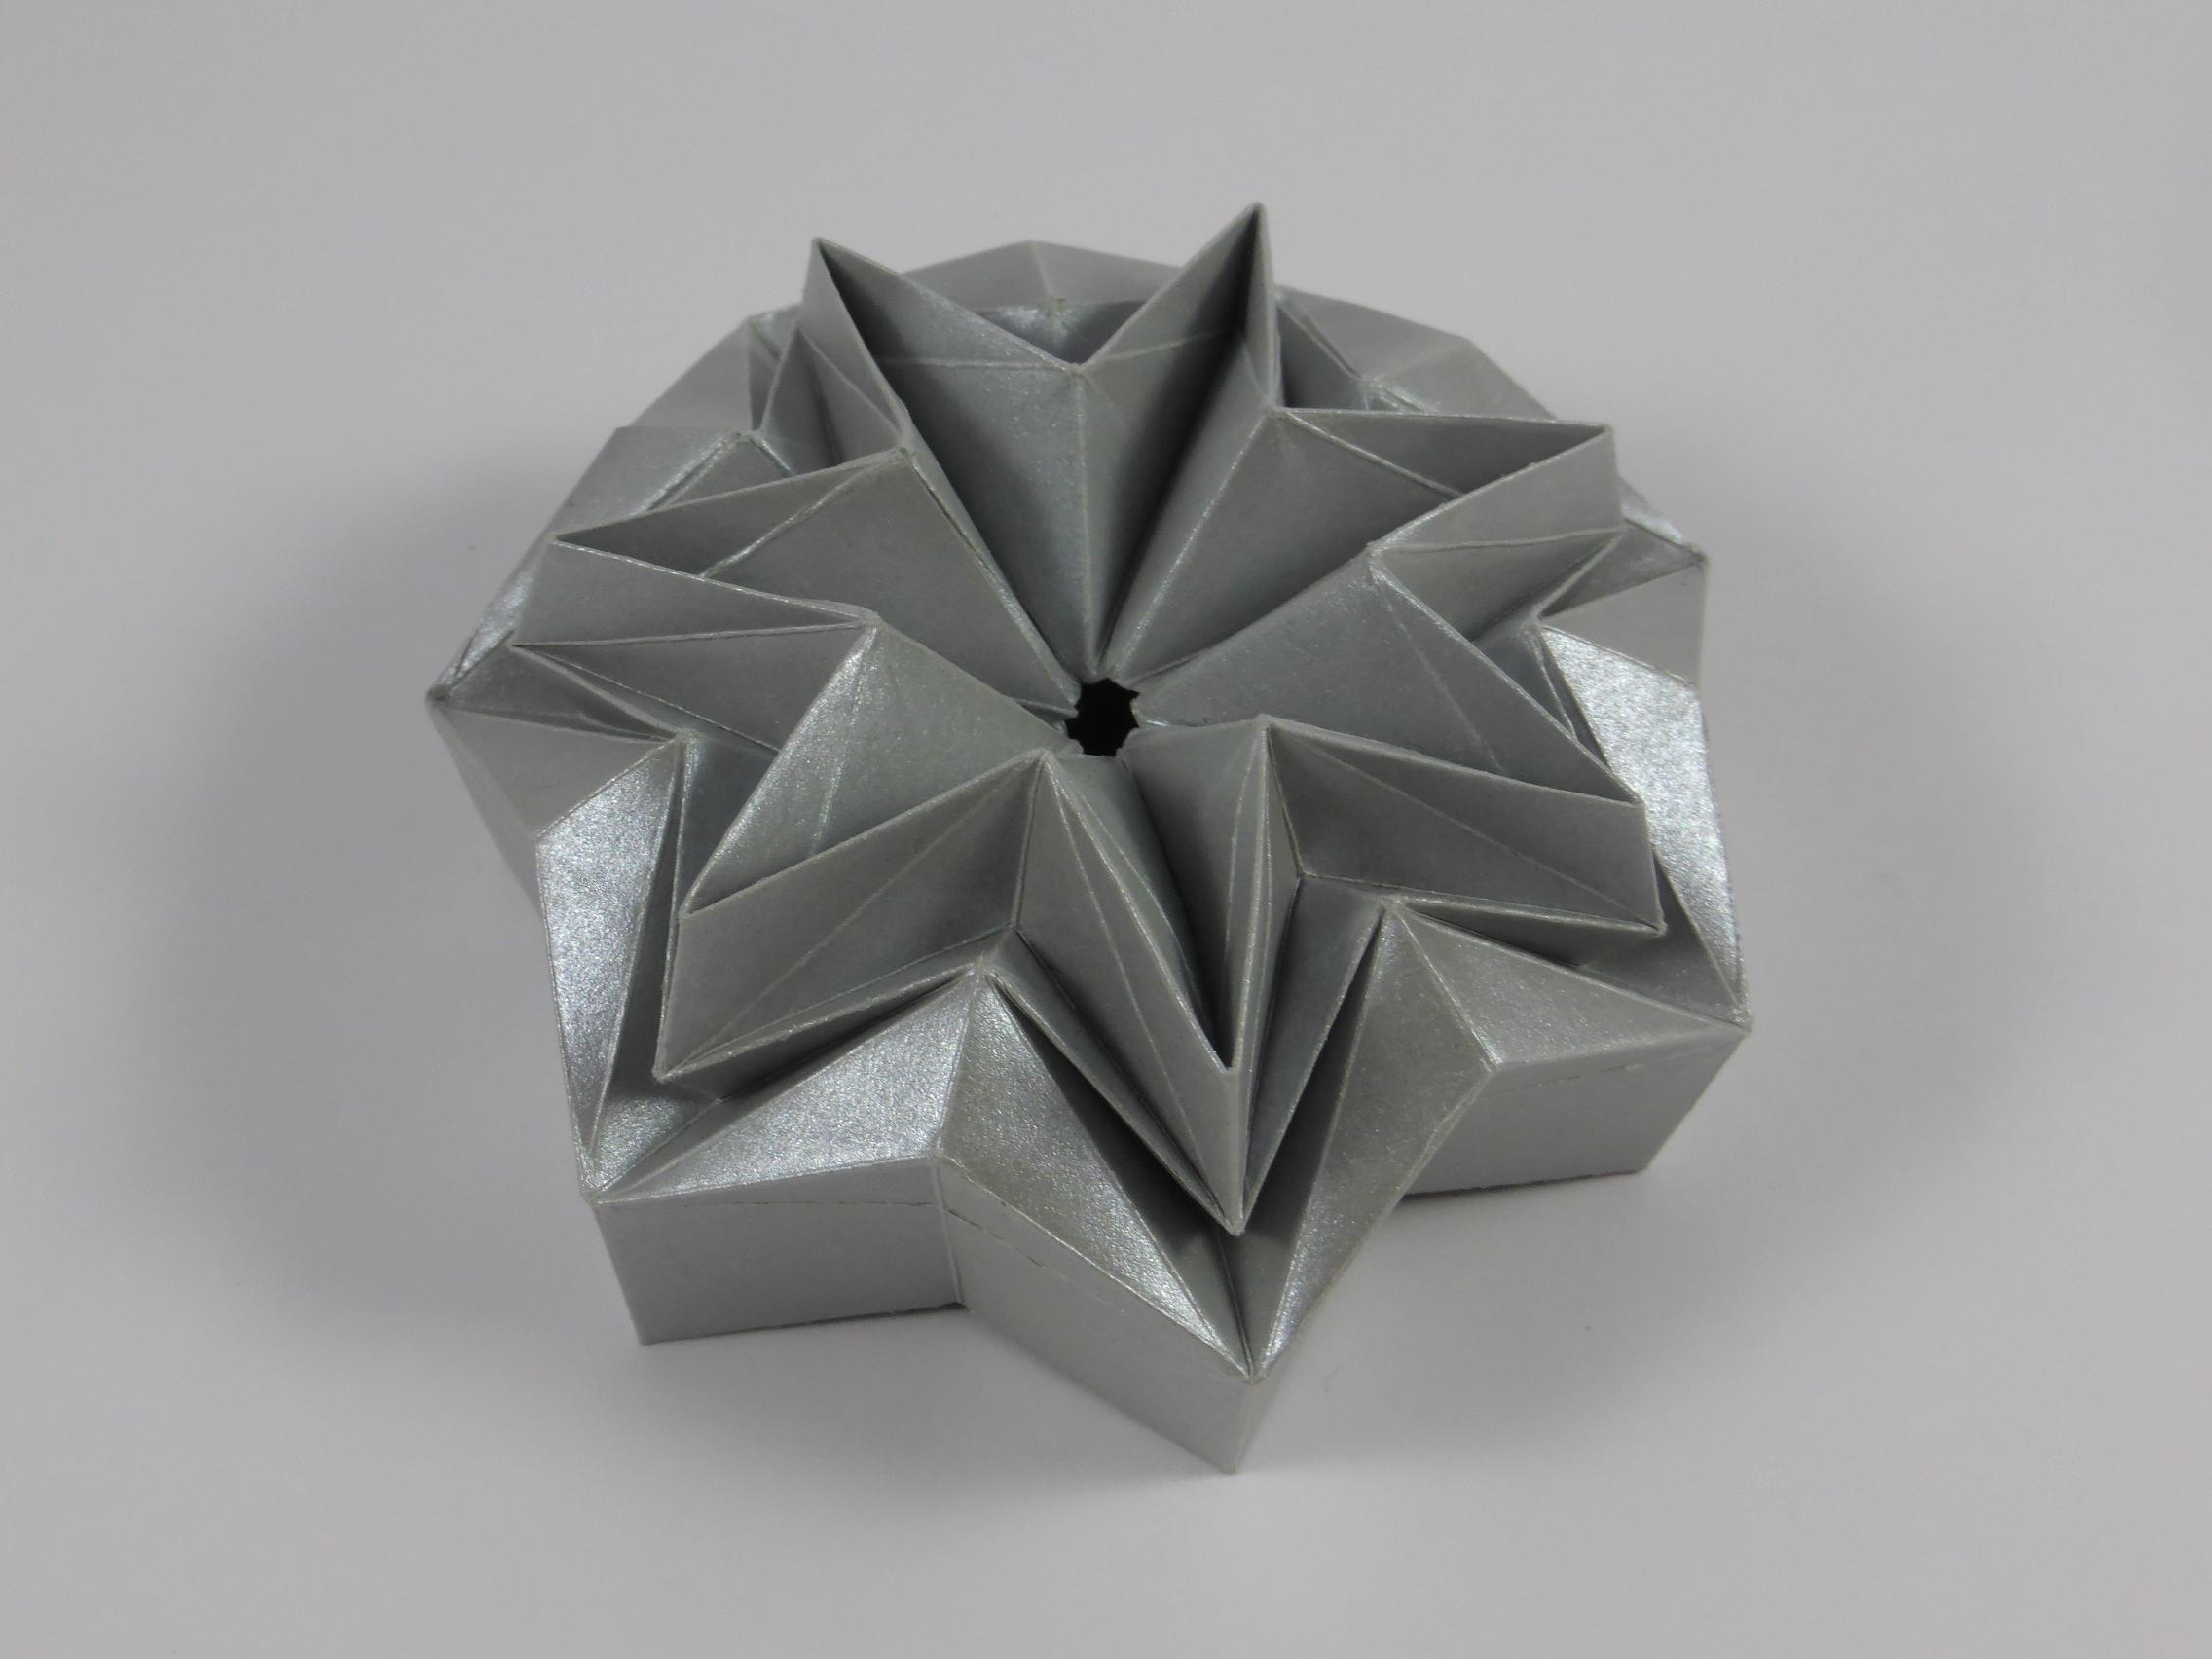 Heptagonal Star Box UD DU Chevron Corrugation